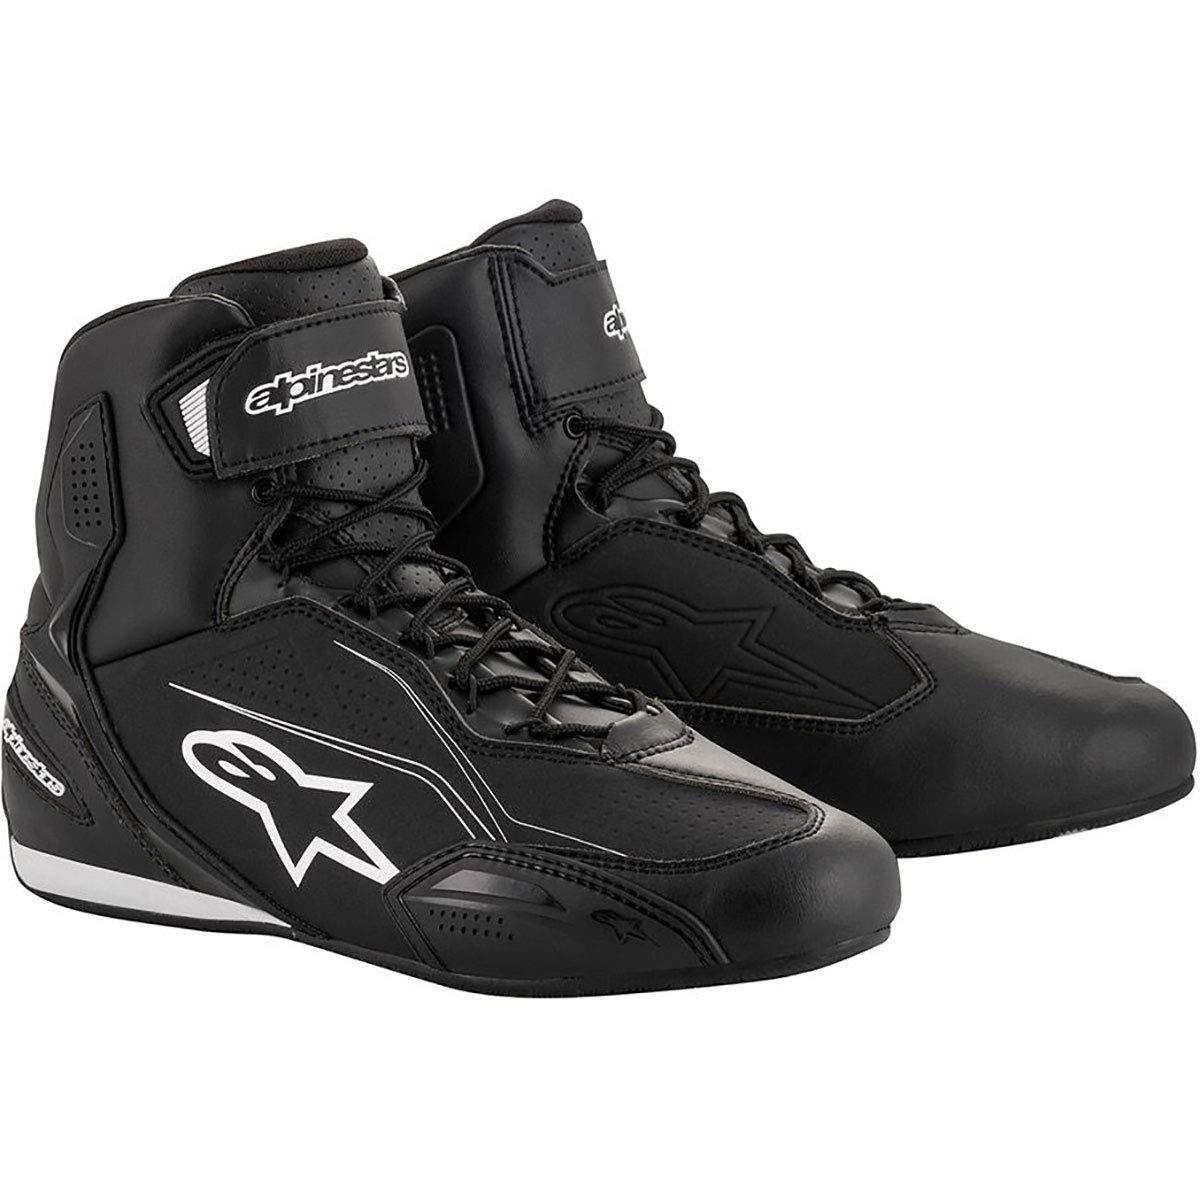 Alpinestars Faster-3 Shoes (12, Black)